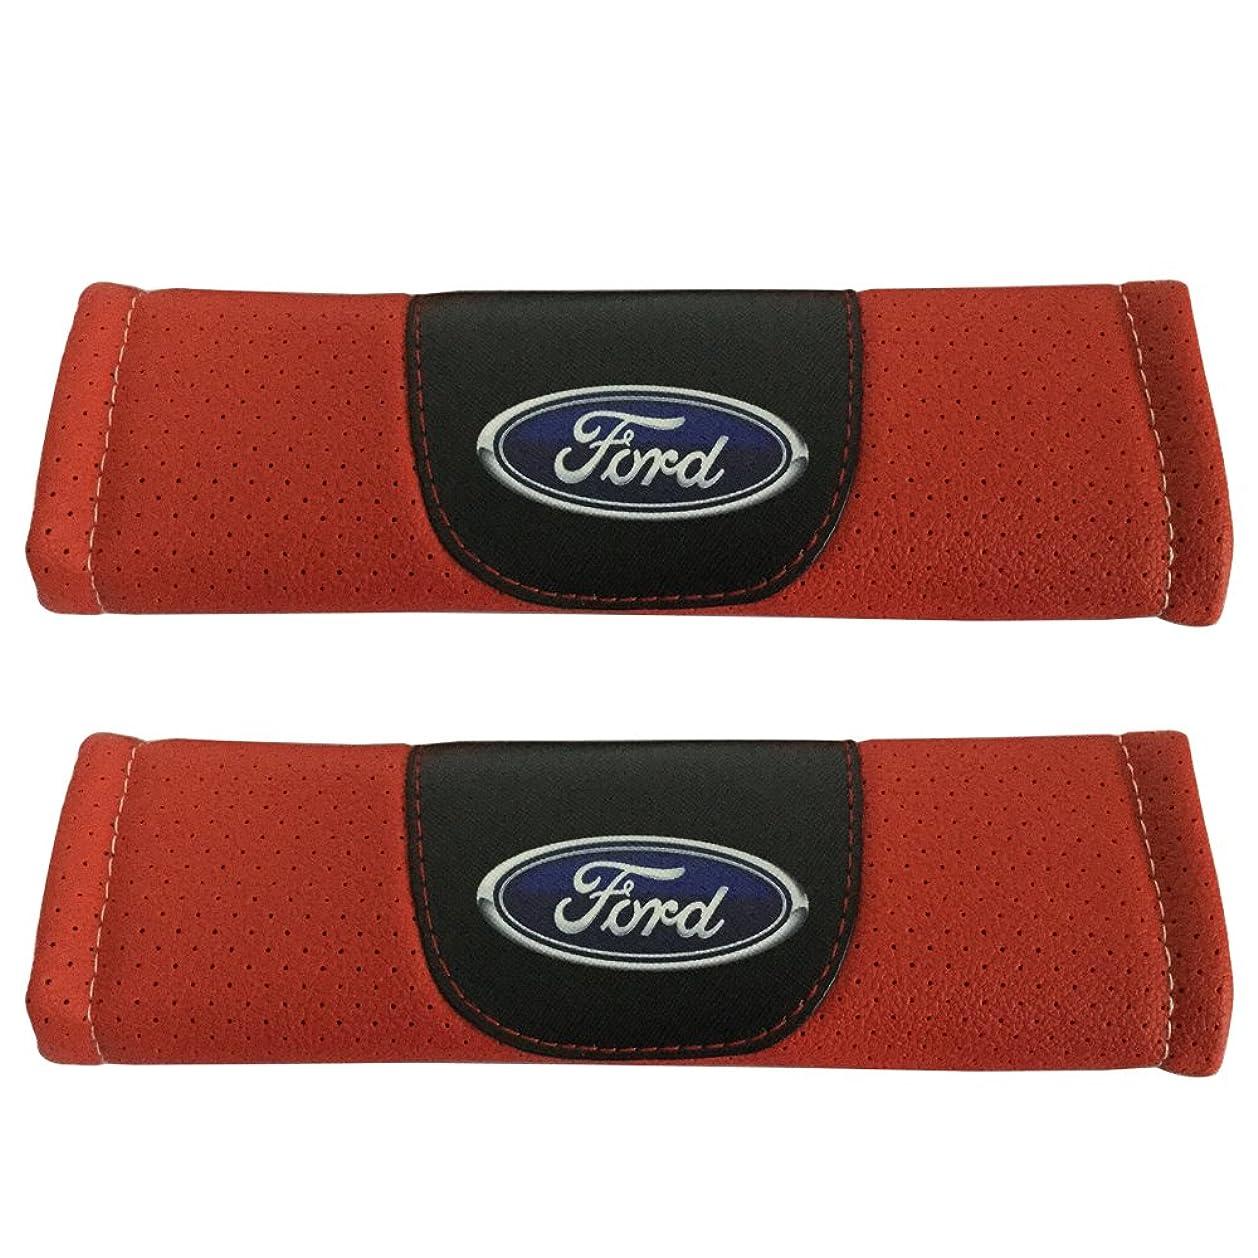 2pcs Ford Logo Leather Car Seat Safety Belt Strap Covers Orange Color Shoulder Pad Accessories Fit For Ford Explorer Ford F-150 Raptor Ford F-250 Super Duty Ford F-350 Super Duty Ford F-450 Super Duty aiusy9599